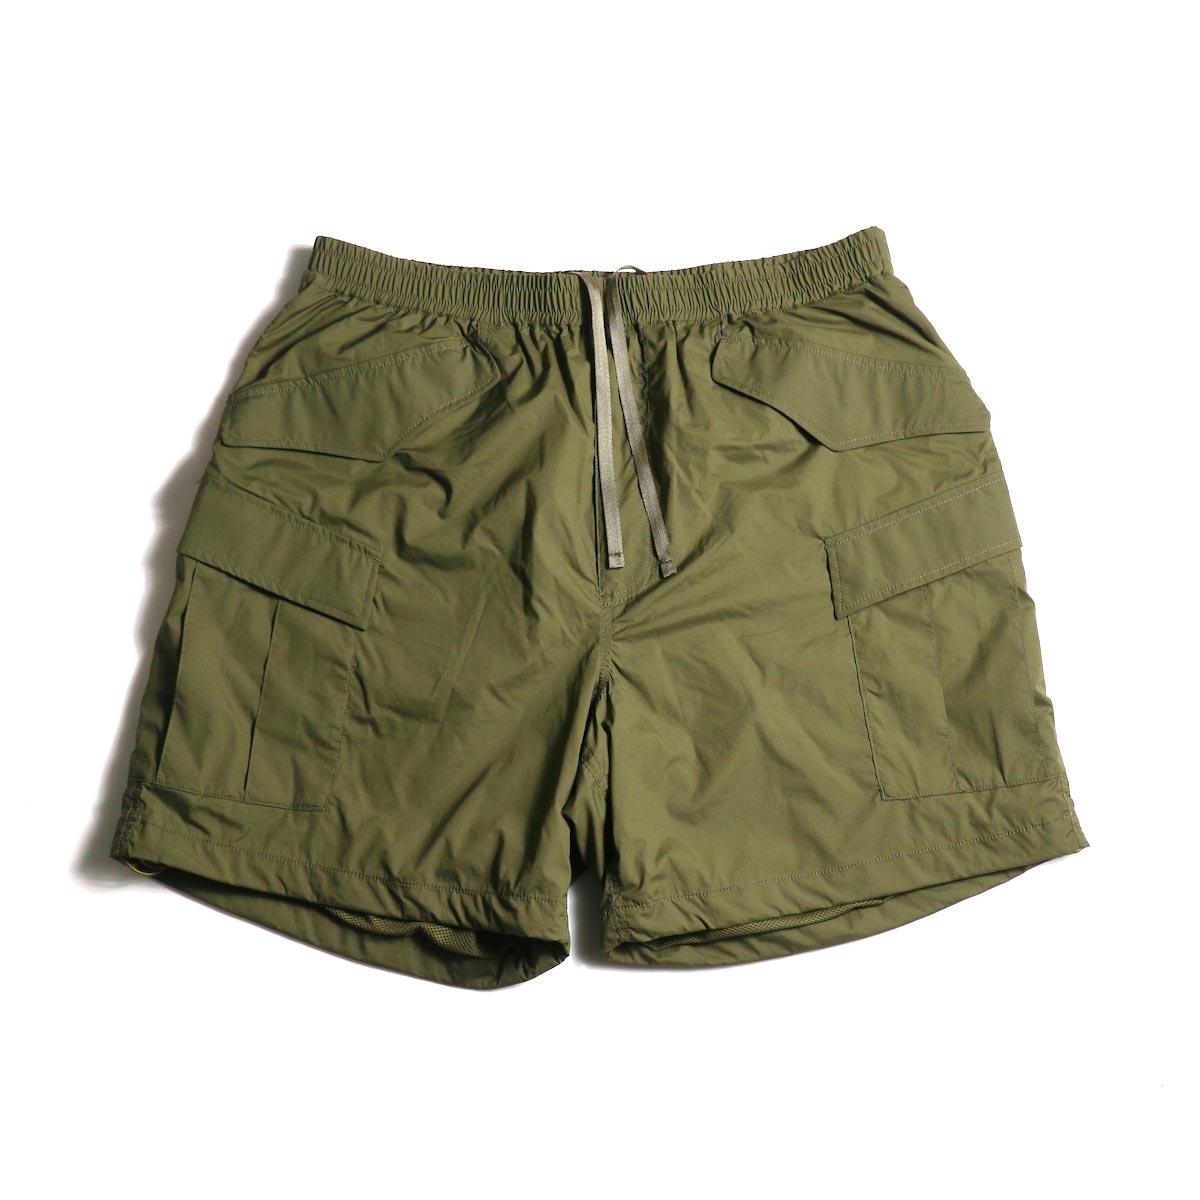 DAIWA PIER39 / Micro Rip-Stop Easy 6P Shorts (Dark Olive)正面